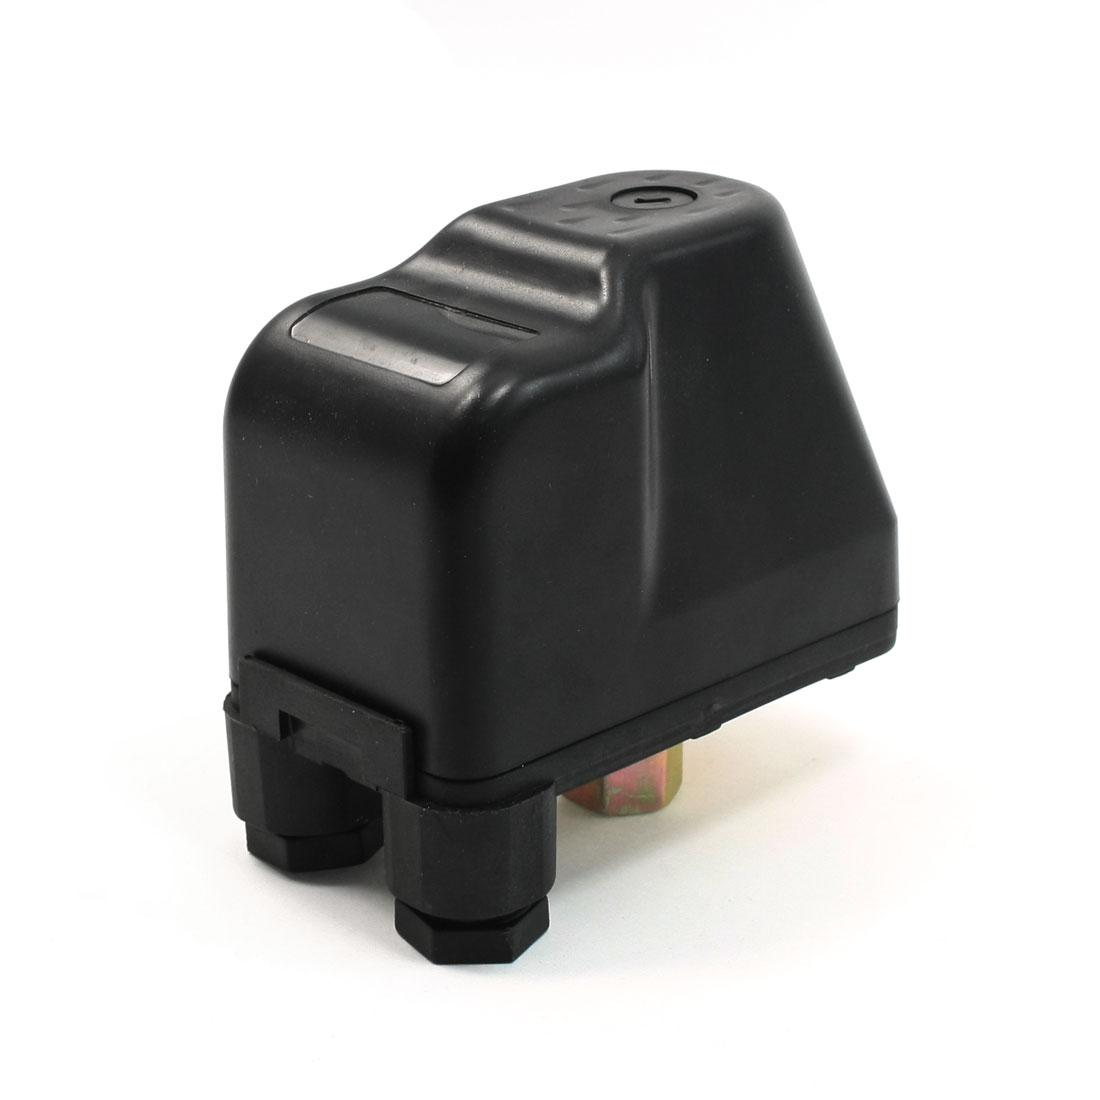 AC 250V IP44 Automatic Air Compressor Pressure Switch Control Valve